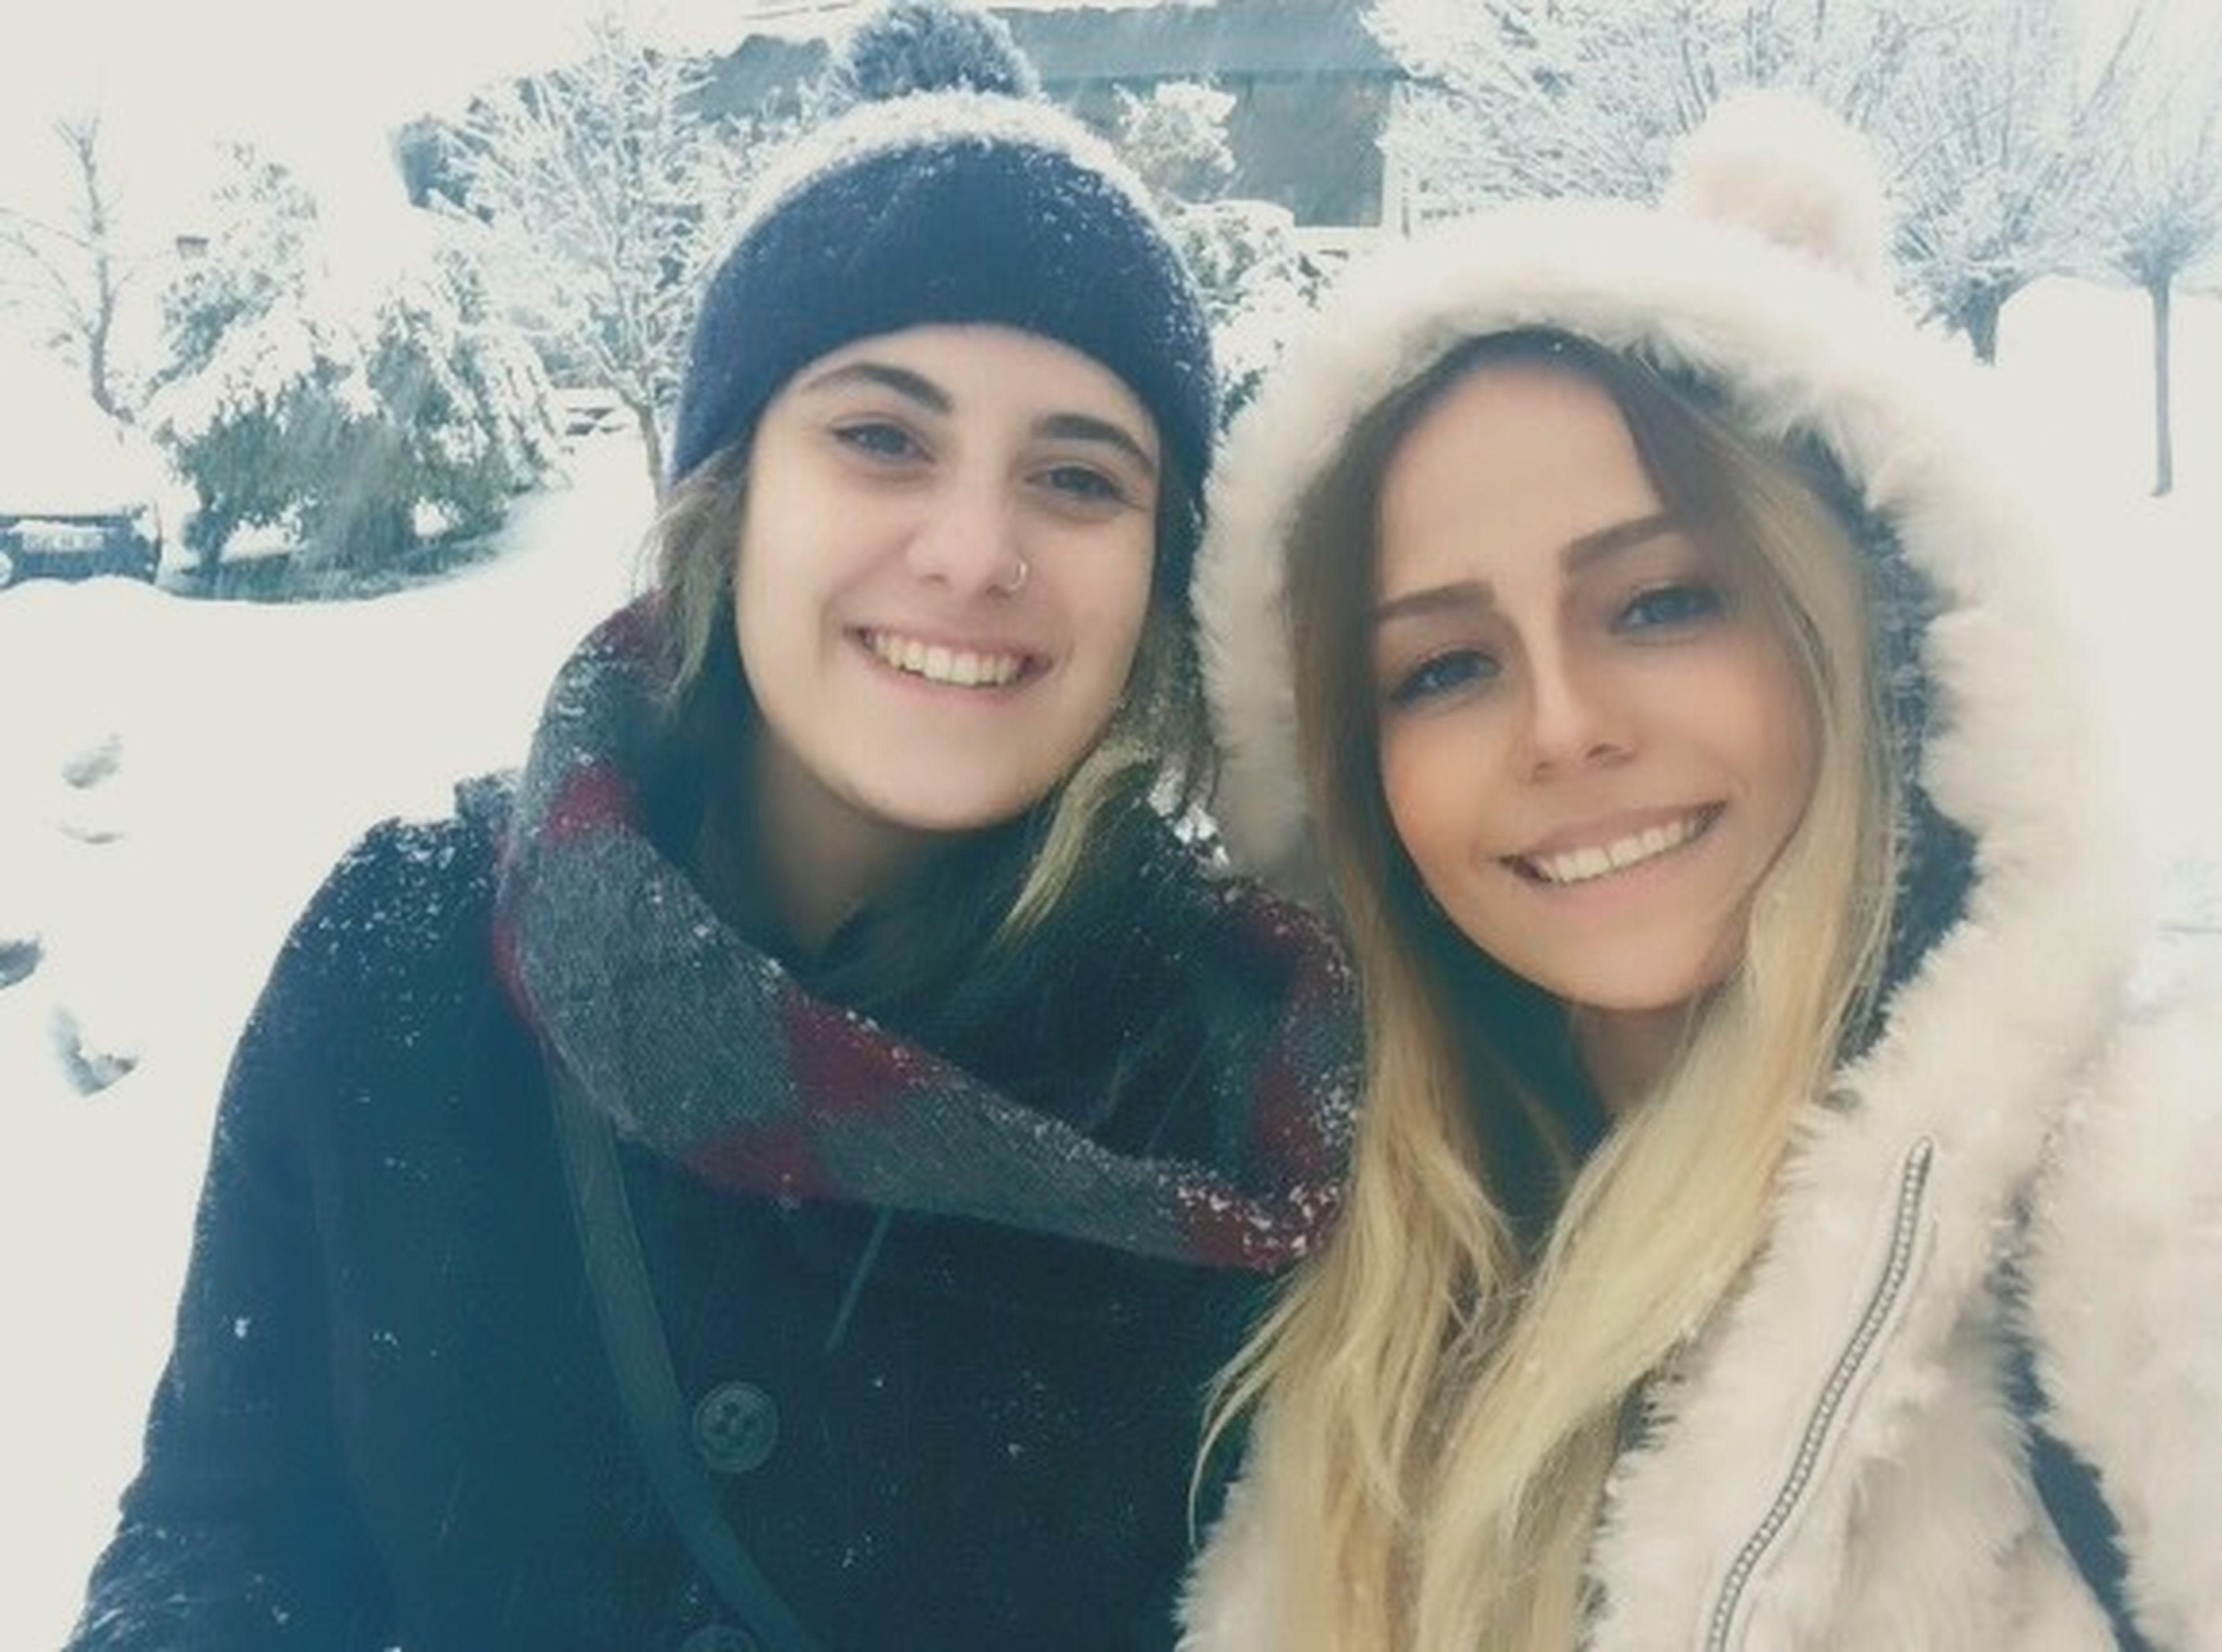 Bestfriend Snow ❄ Wintertime Hello World Besties